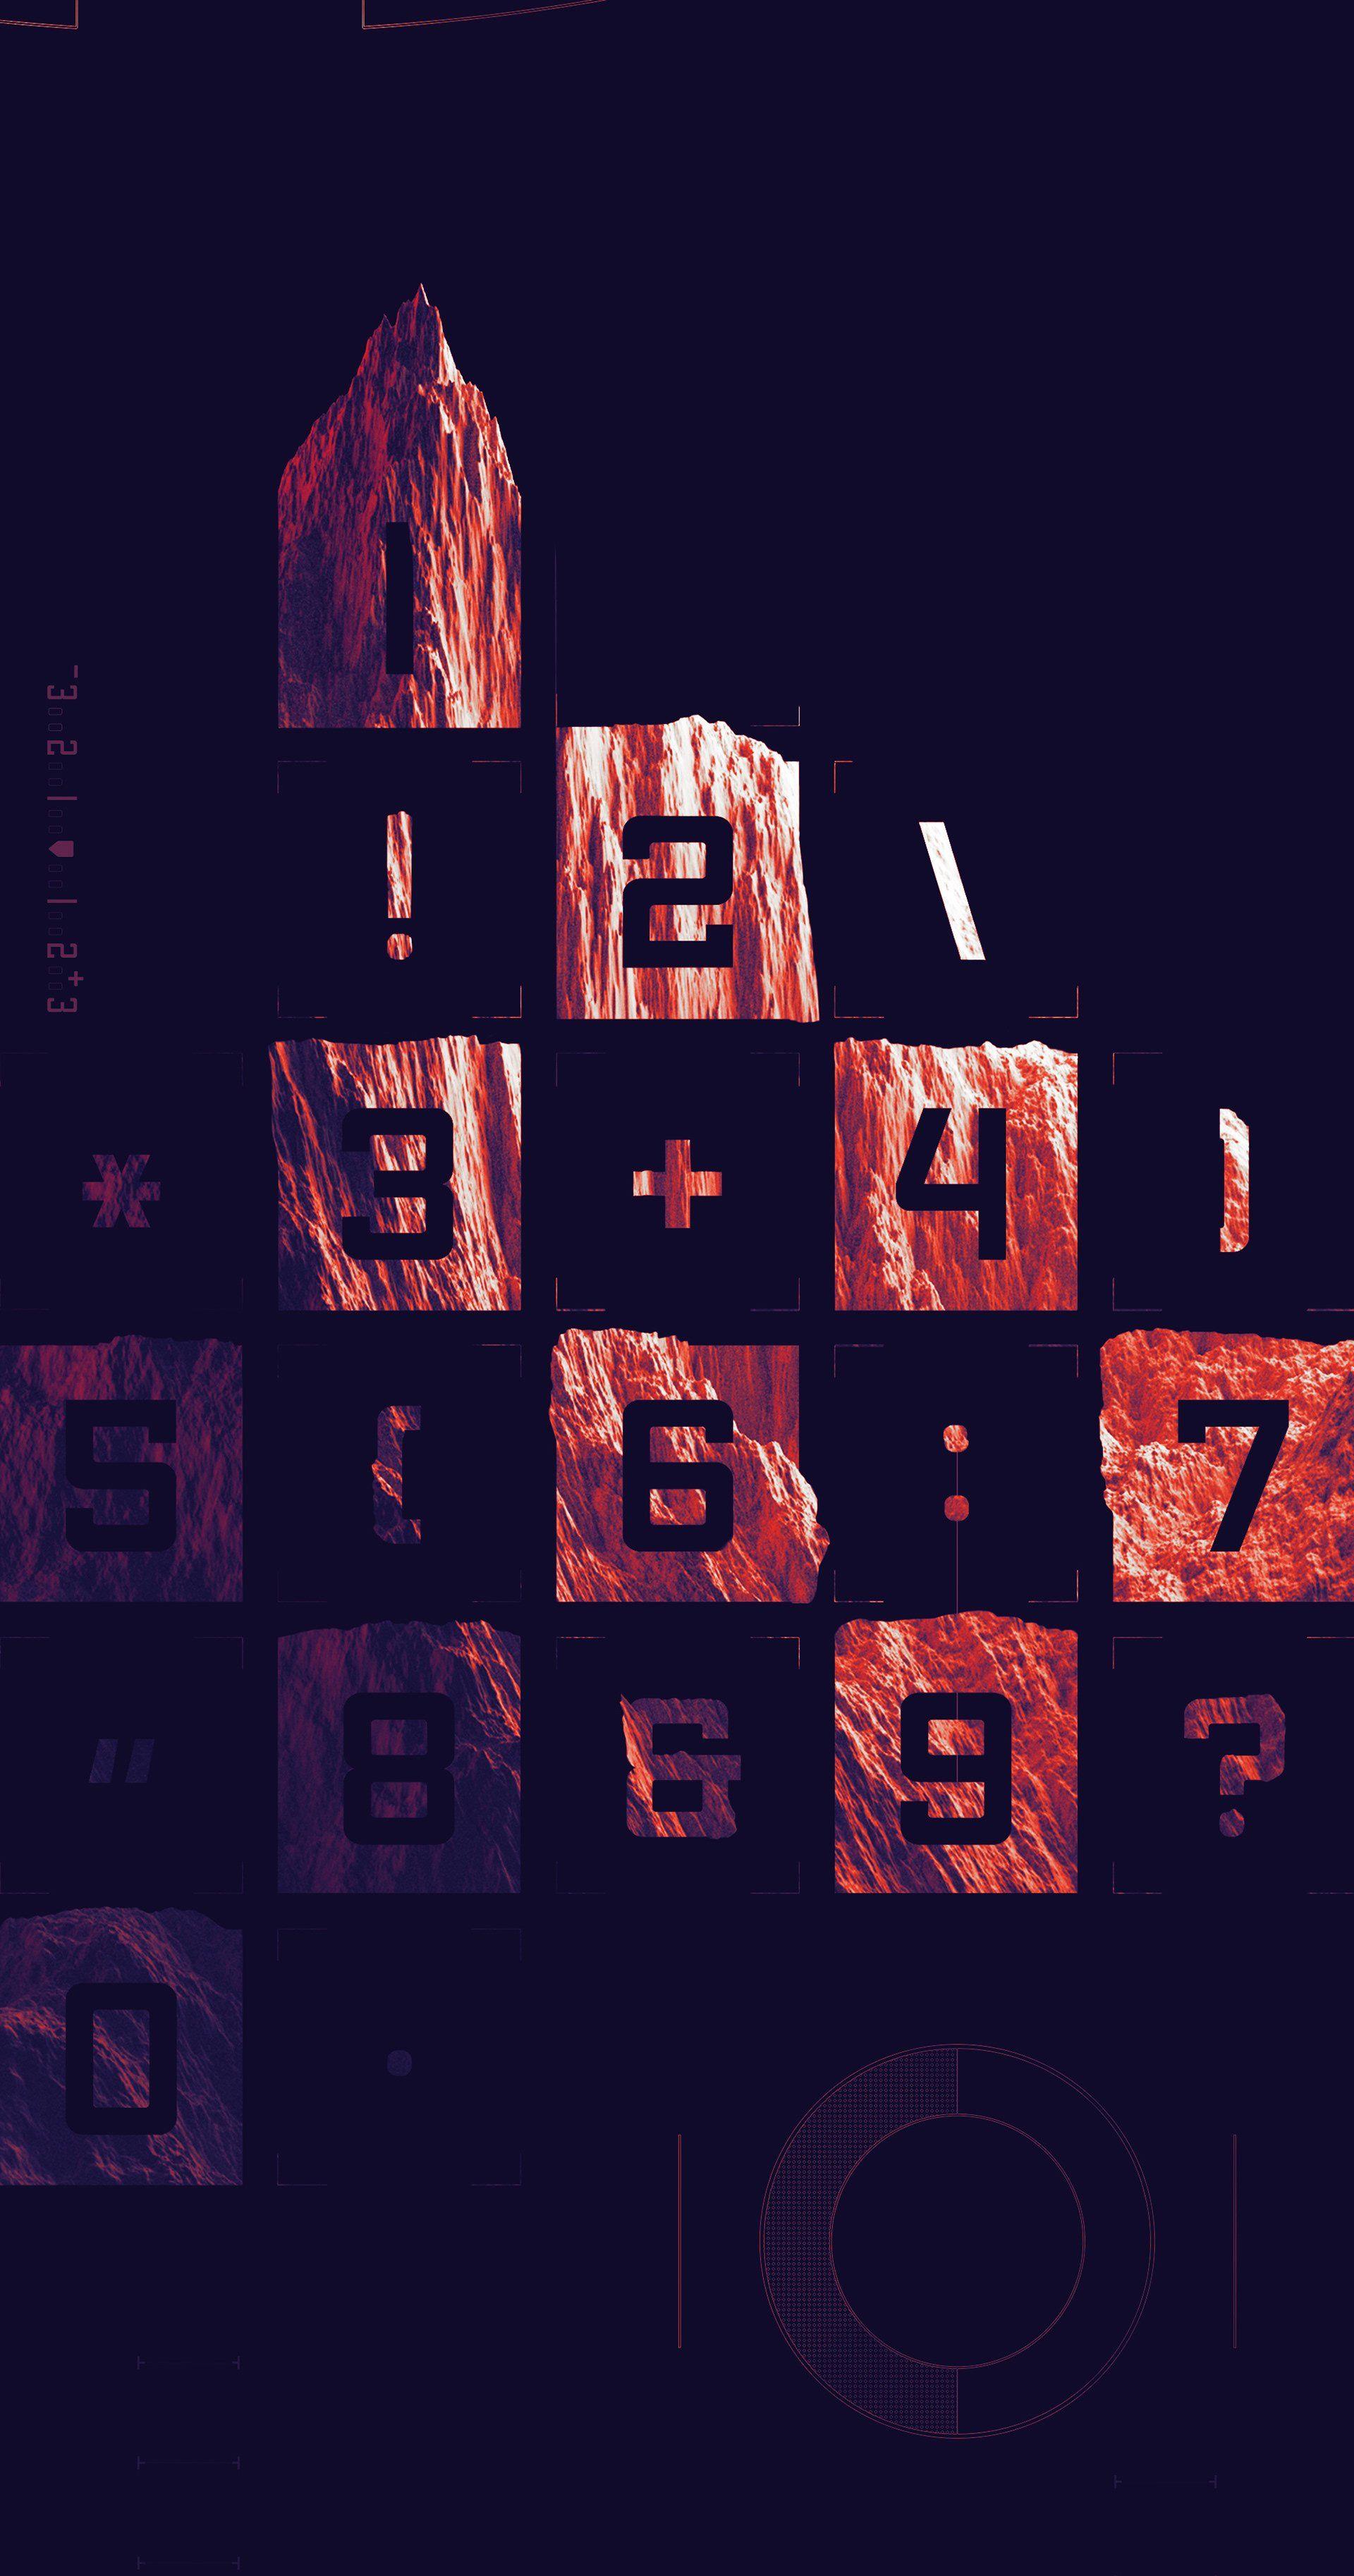 Download APEX Mk2 Free Font (With images) | Free font, Sans serif ...